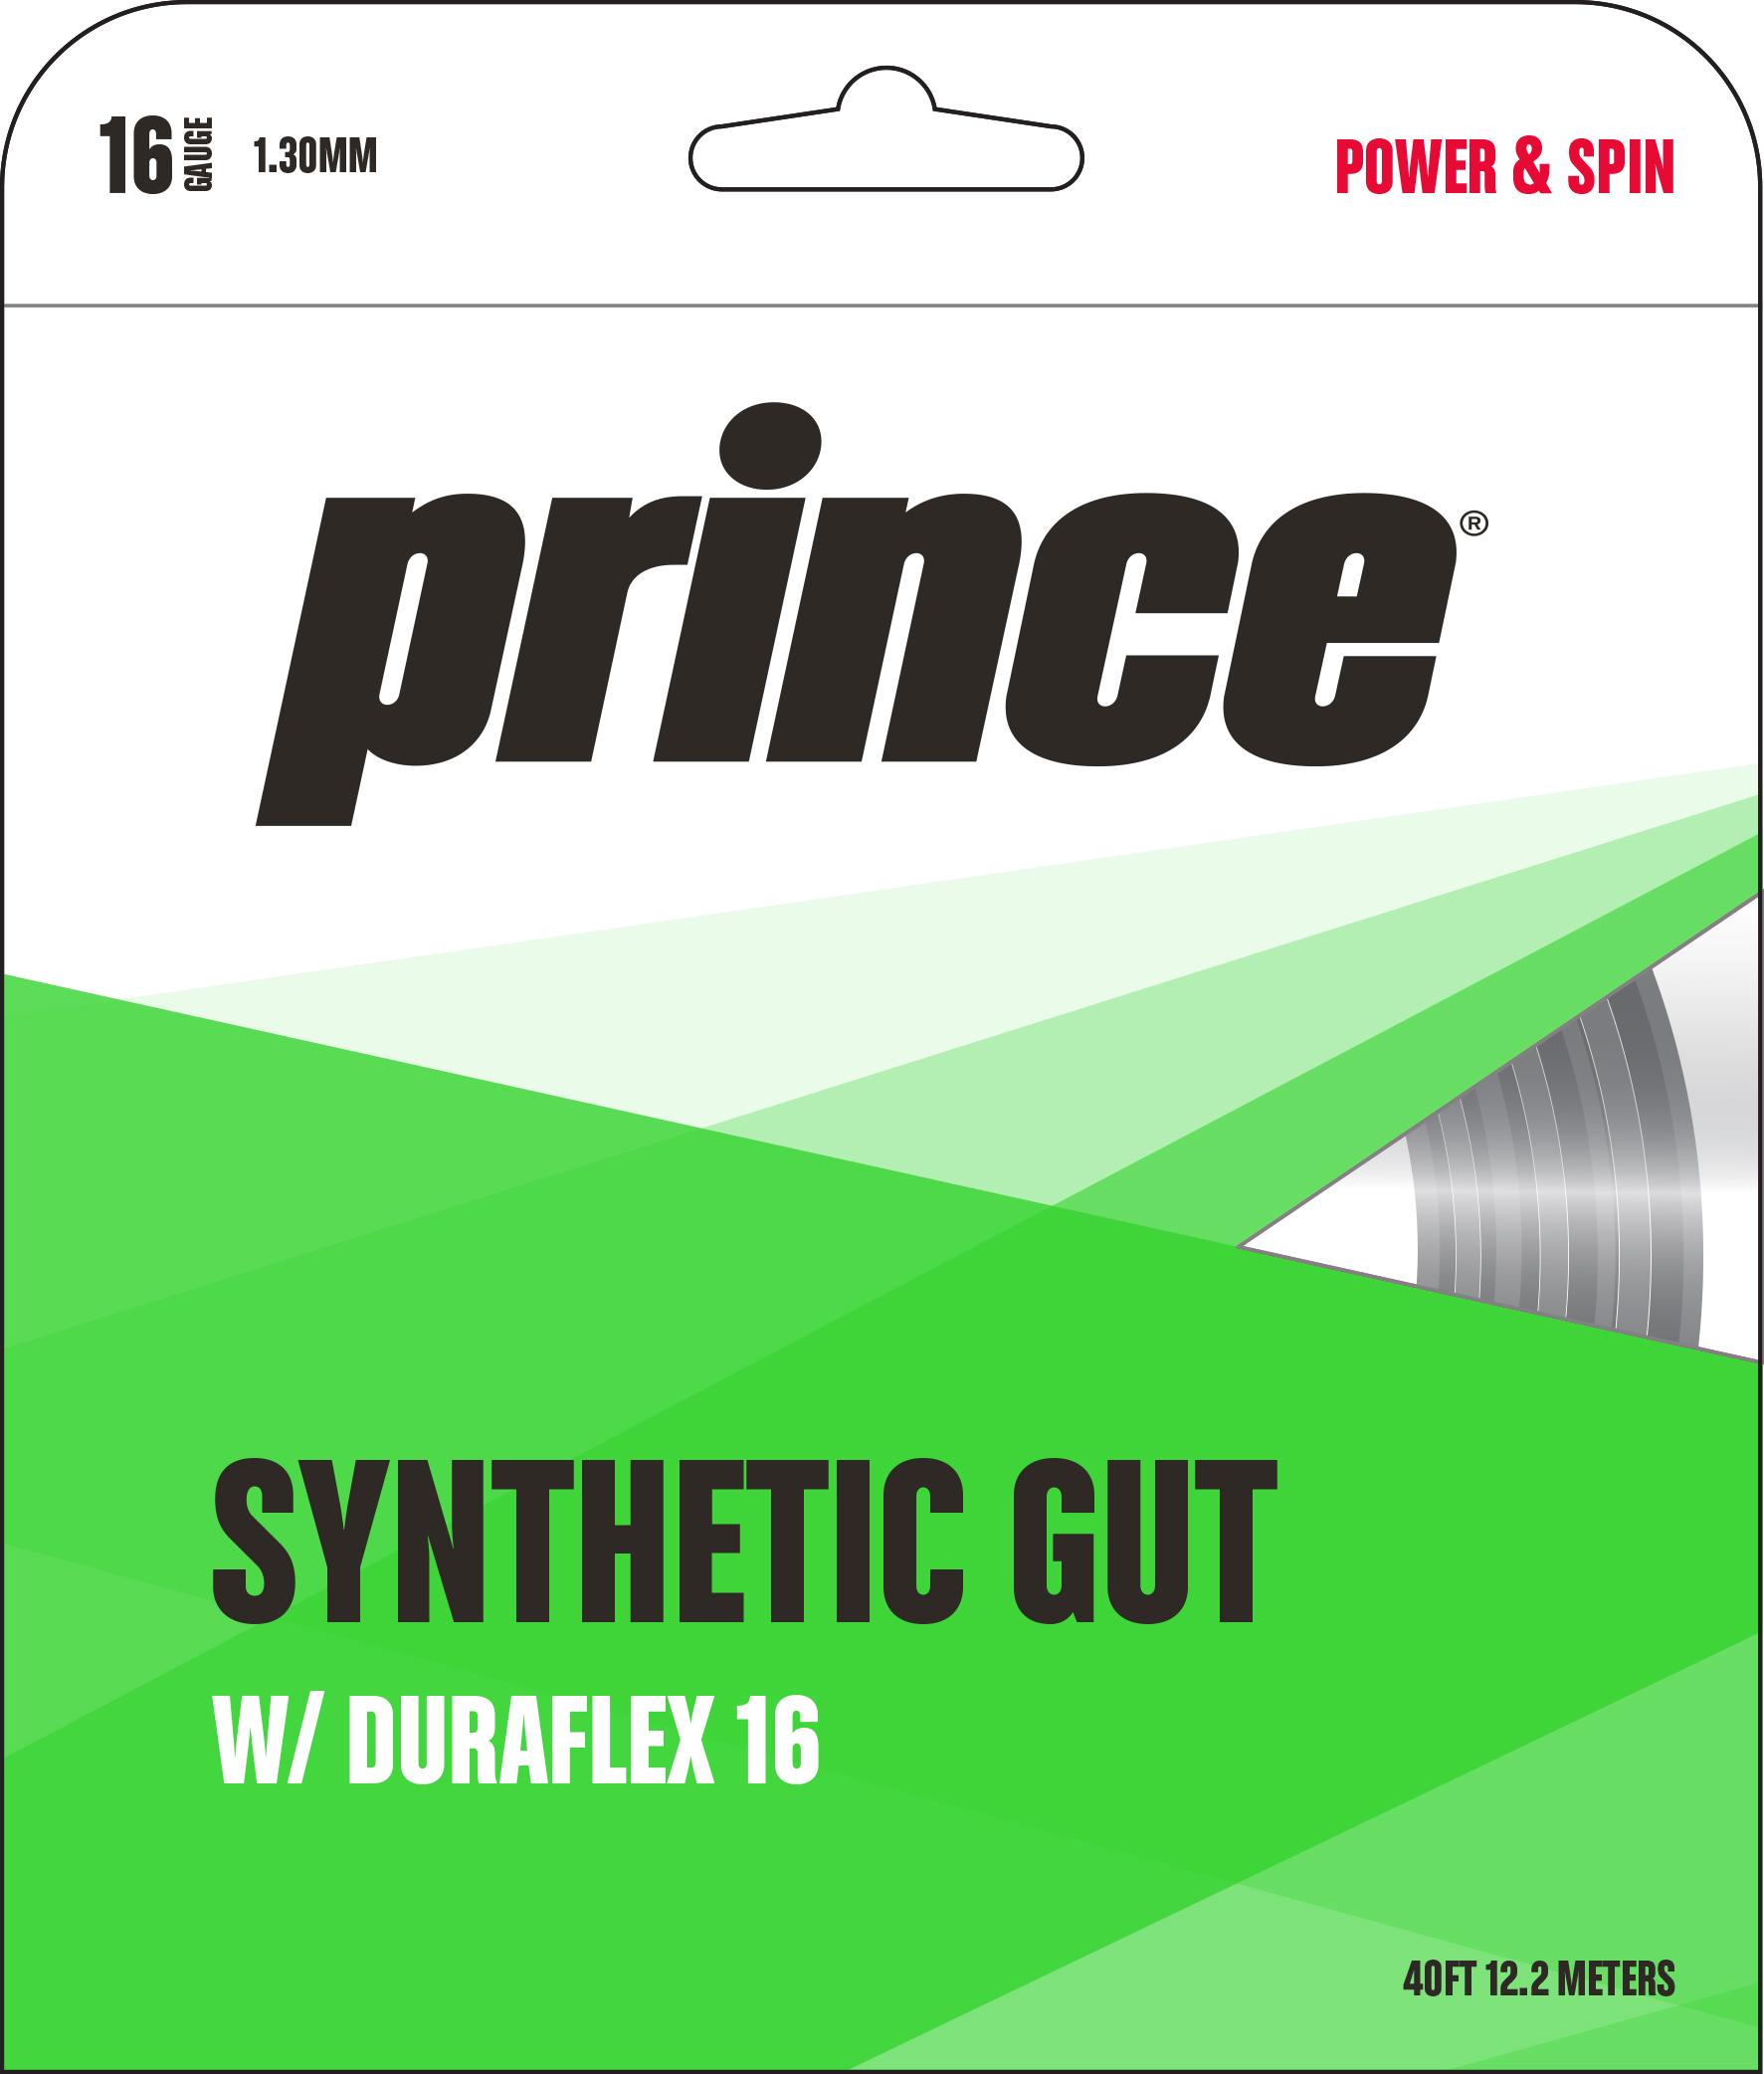 STRING_SYNTHETIC GUT DURAFLEX 16.jpg